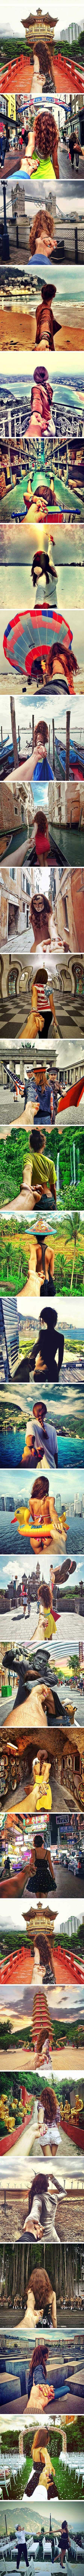 Photographers girlfriend leads him around the world....